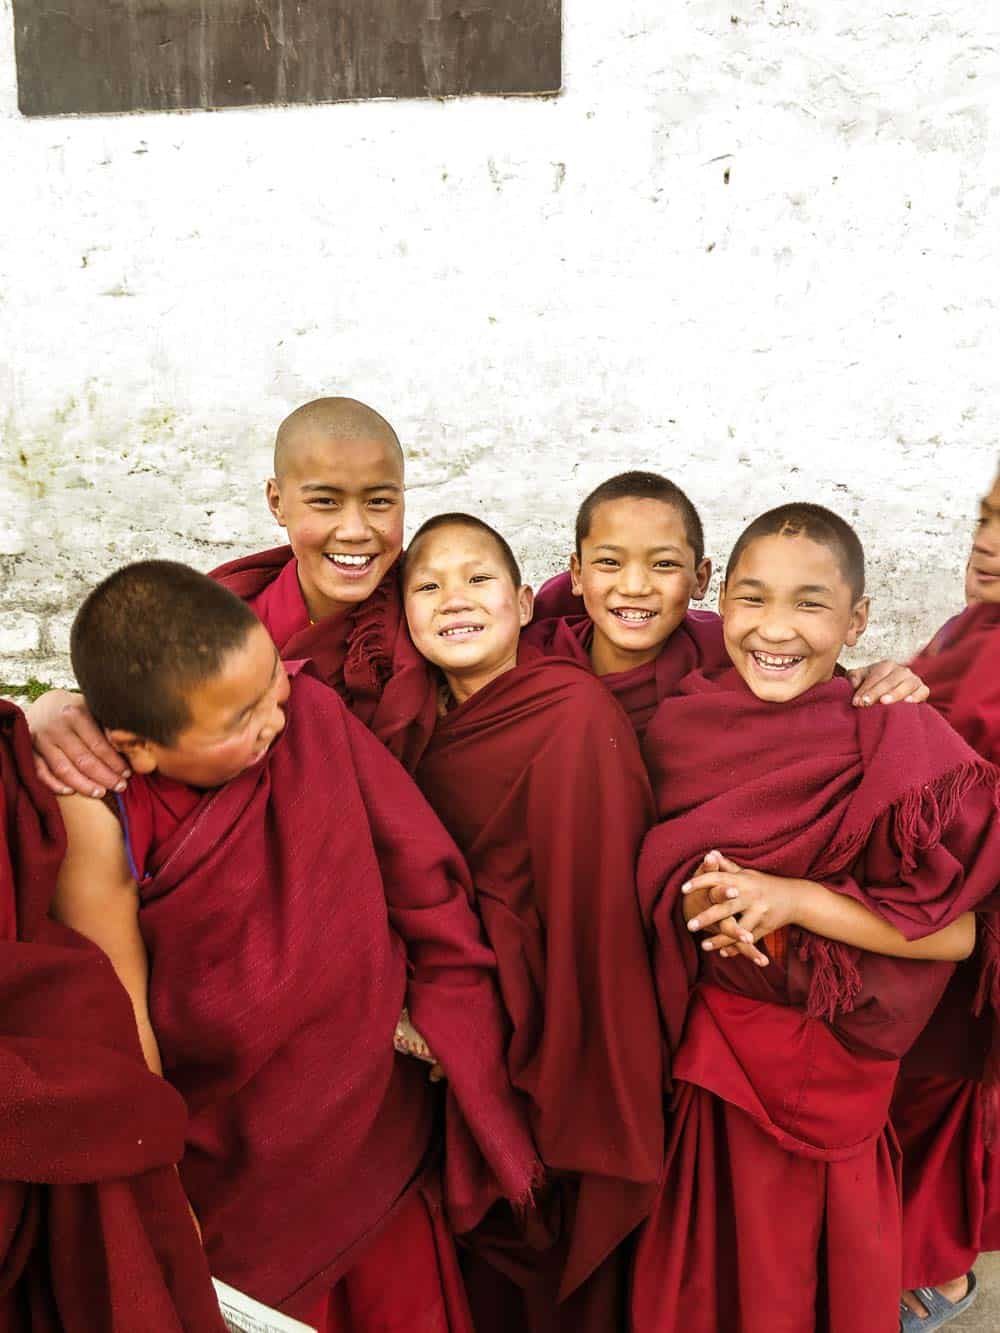 Arunachal Pradesh religion